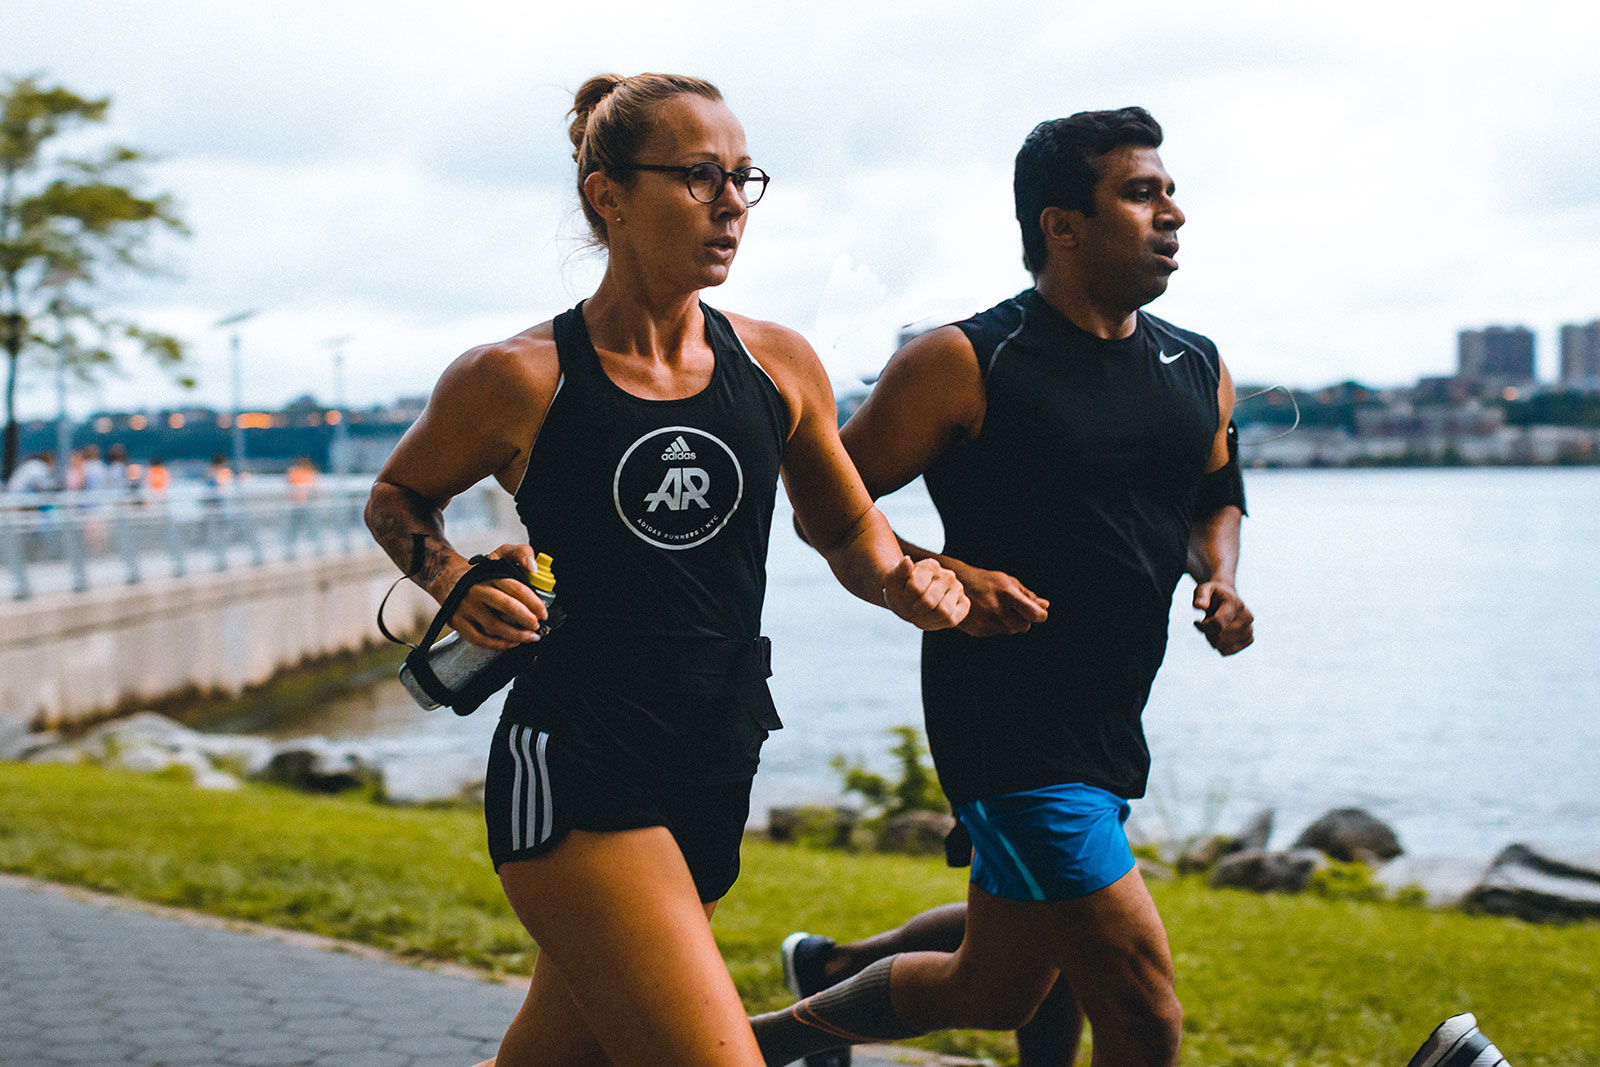 sabrina Wieser adidas runners